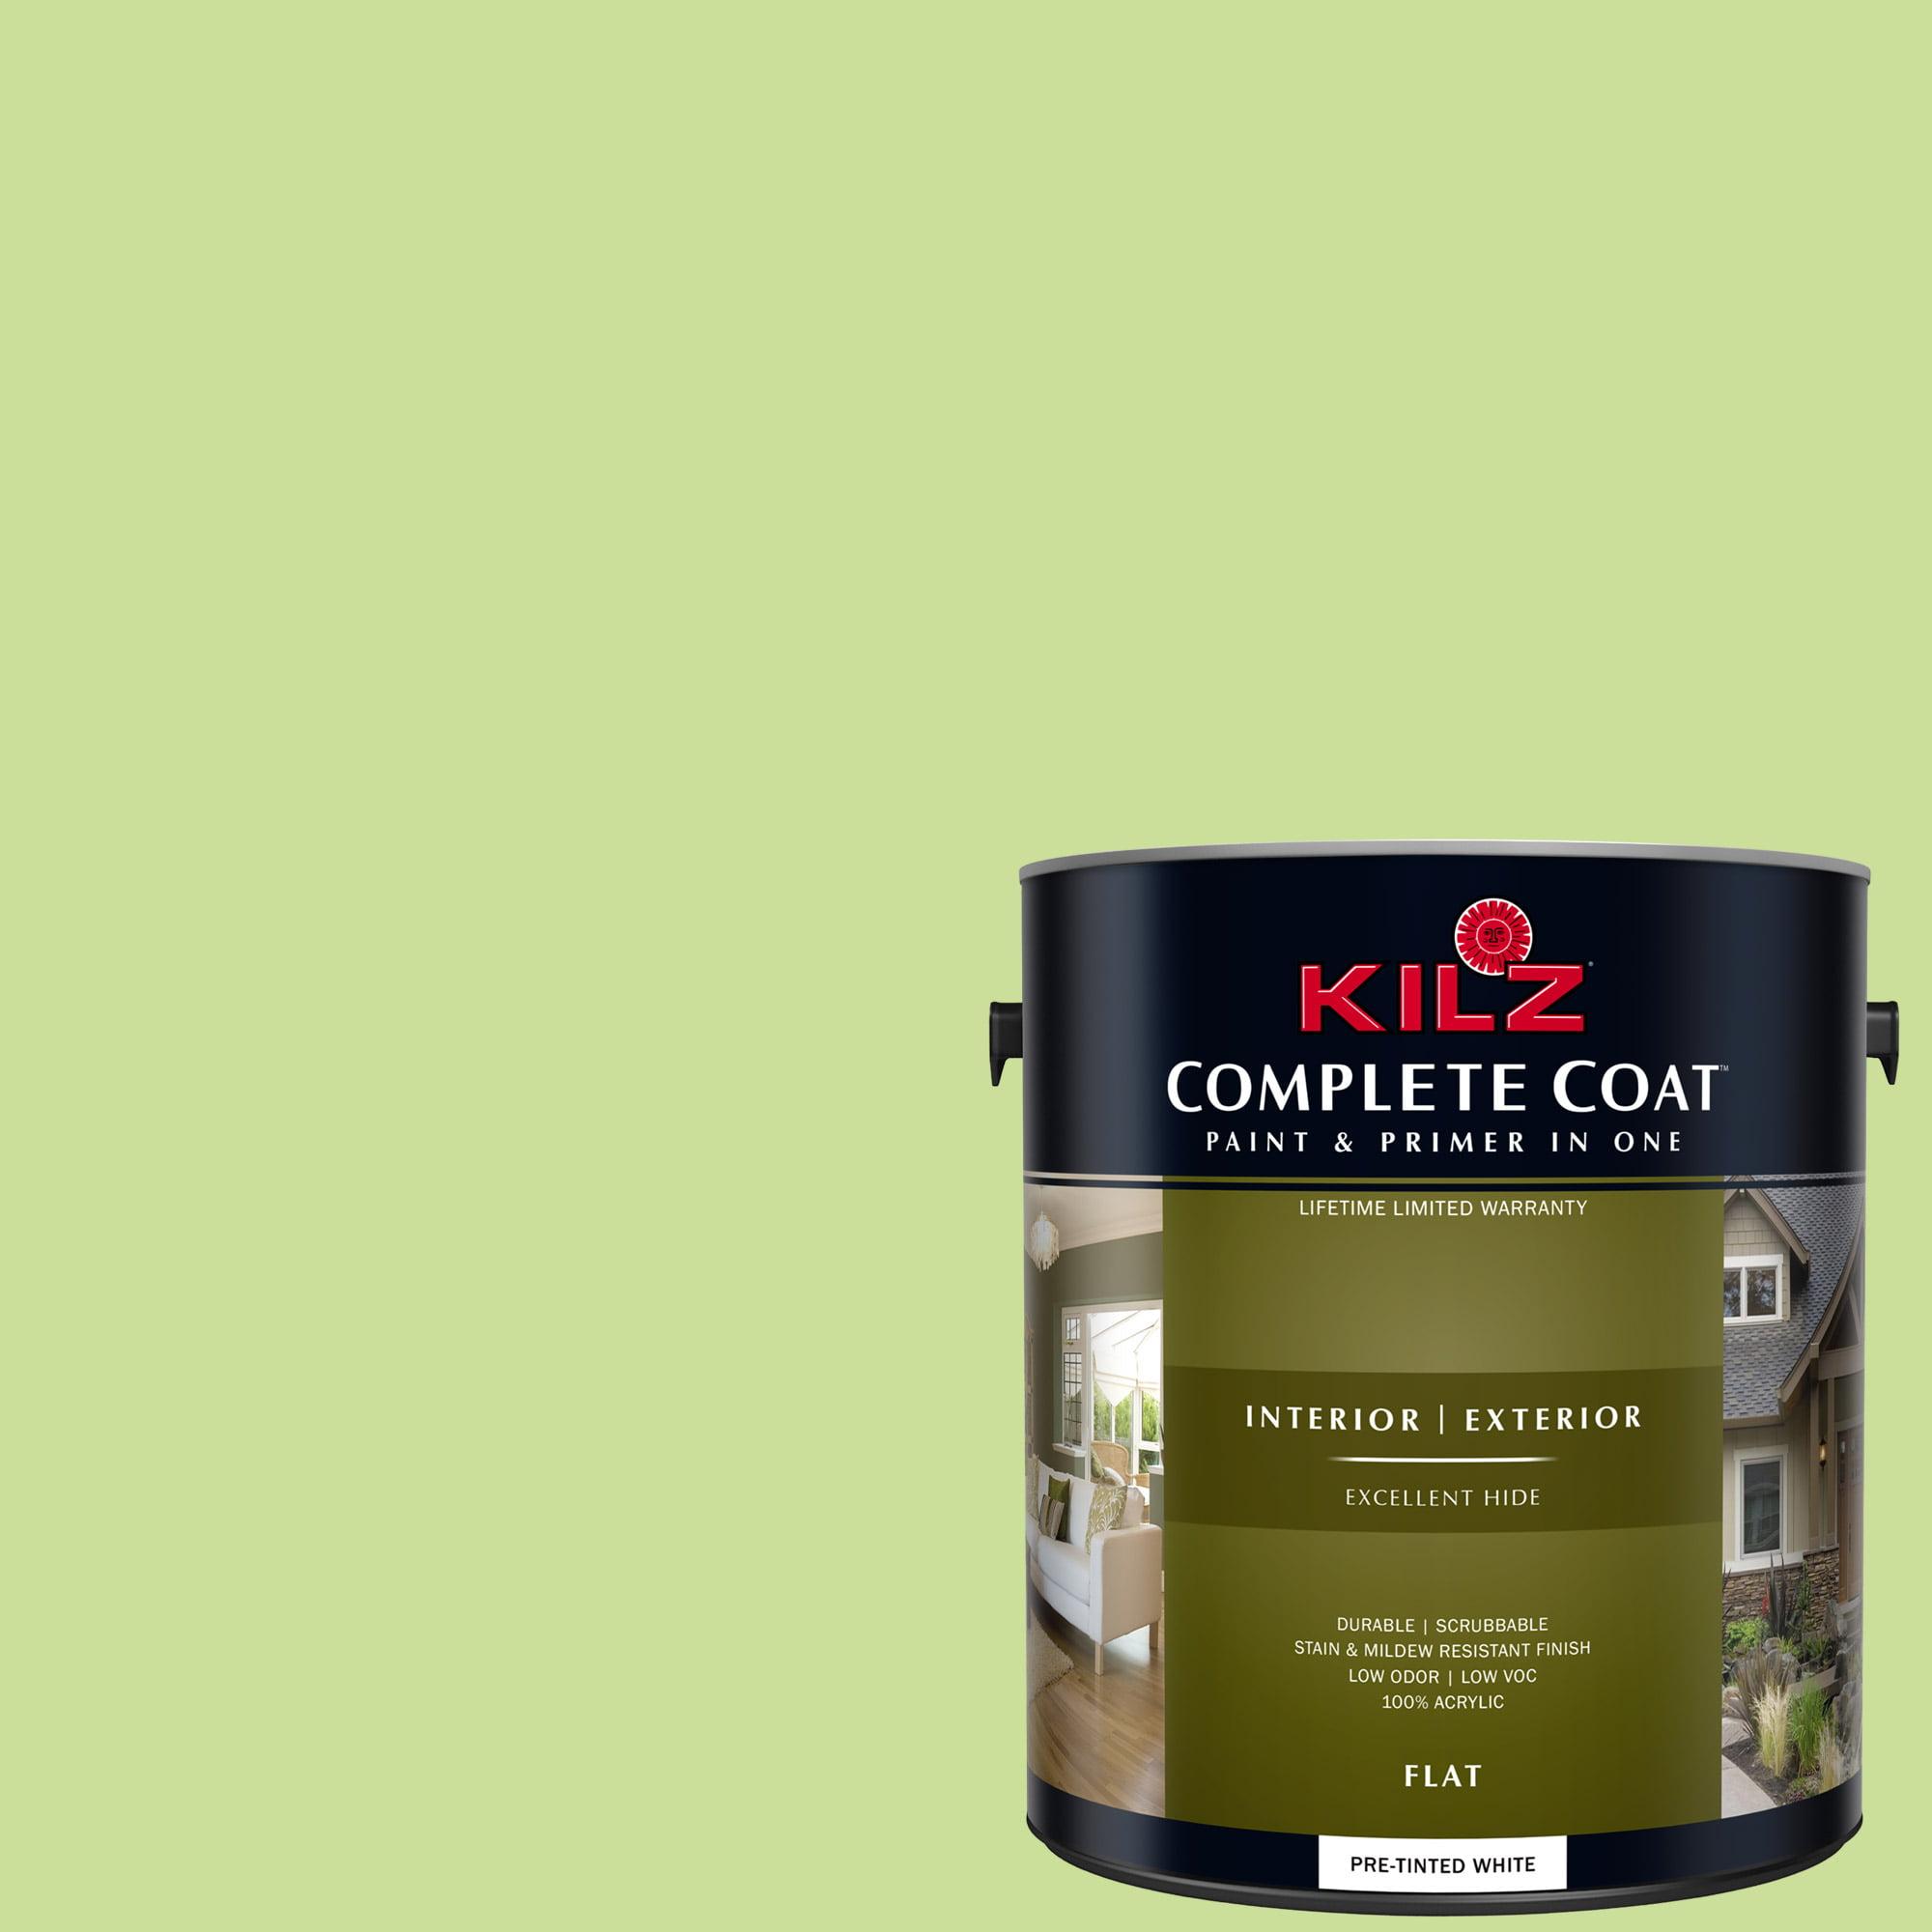 KILZ COMPLETE COAT Interior/Exterior Paint & Primer in One #LG240-01 Tree Line